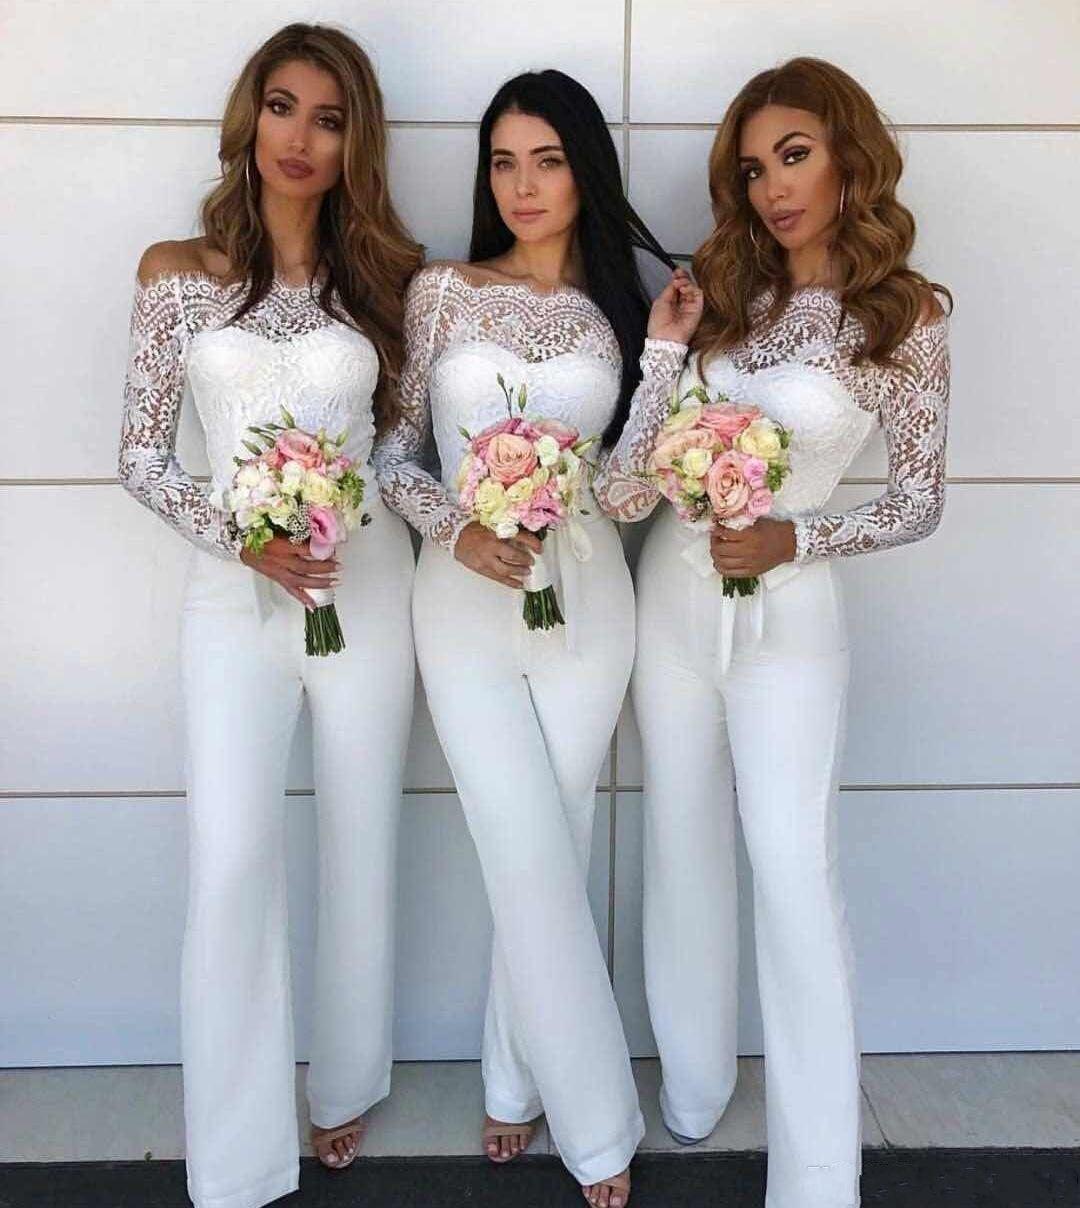 a118dd61b91 2018 Off Shoulder Lace Jumpsuit Bridesmaid Dresses For Wedding Sheath  Backless Wedding Guest Pants Gowns Plus Size Pant Suit Beach Affordable  Bridesmaids ...